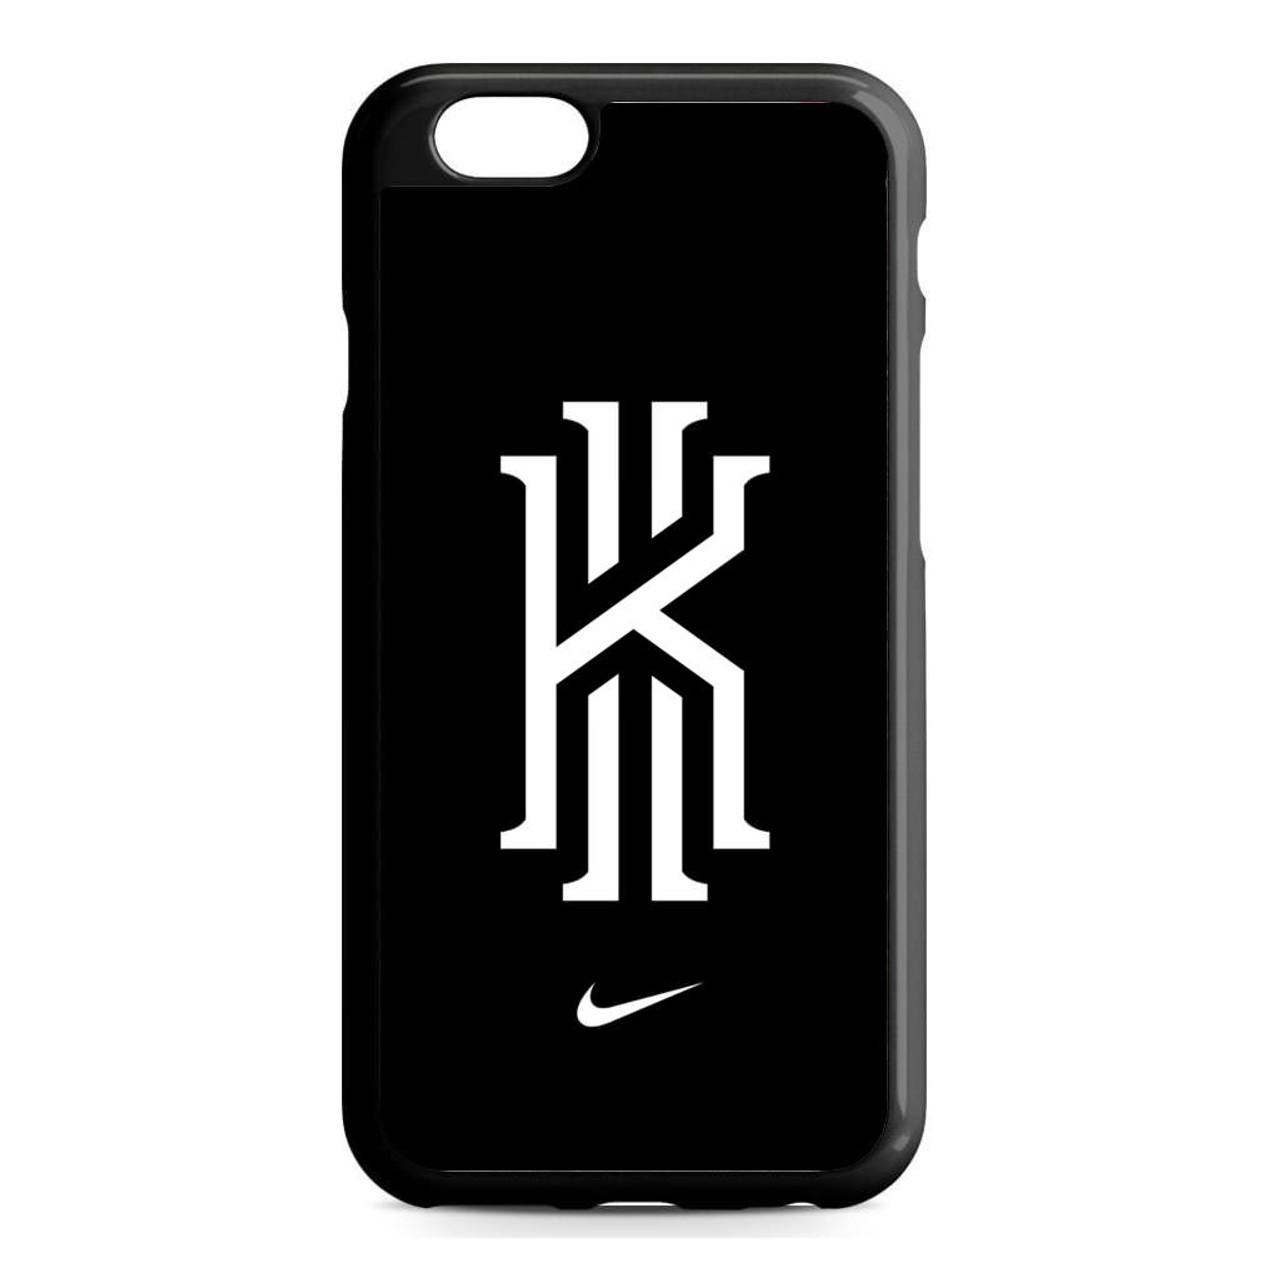 e39c4e8630ce Kyrie Irving Nike Logo Black1 iPhone 6 6S Case - GGIANS